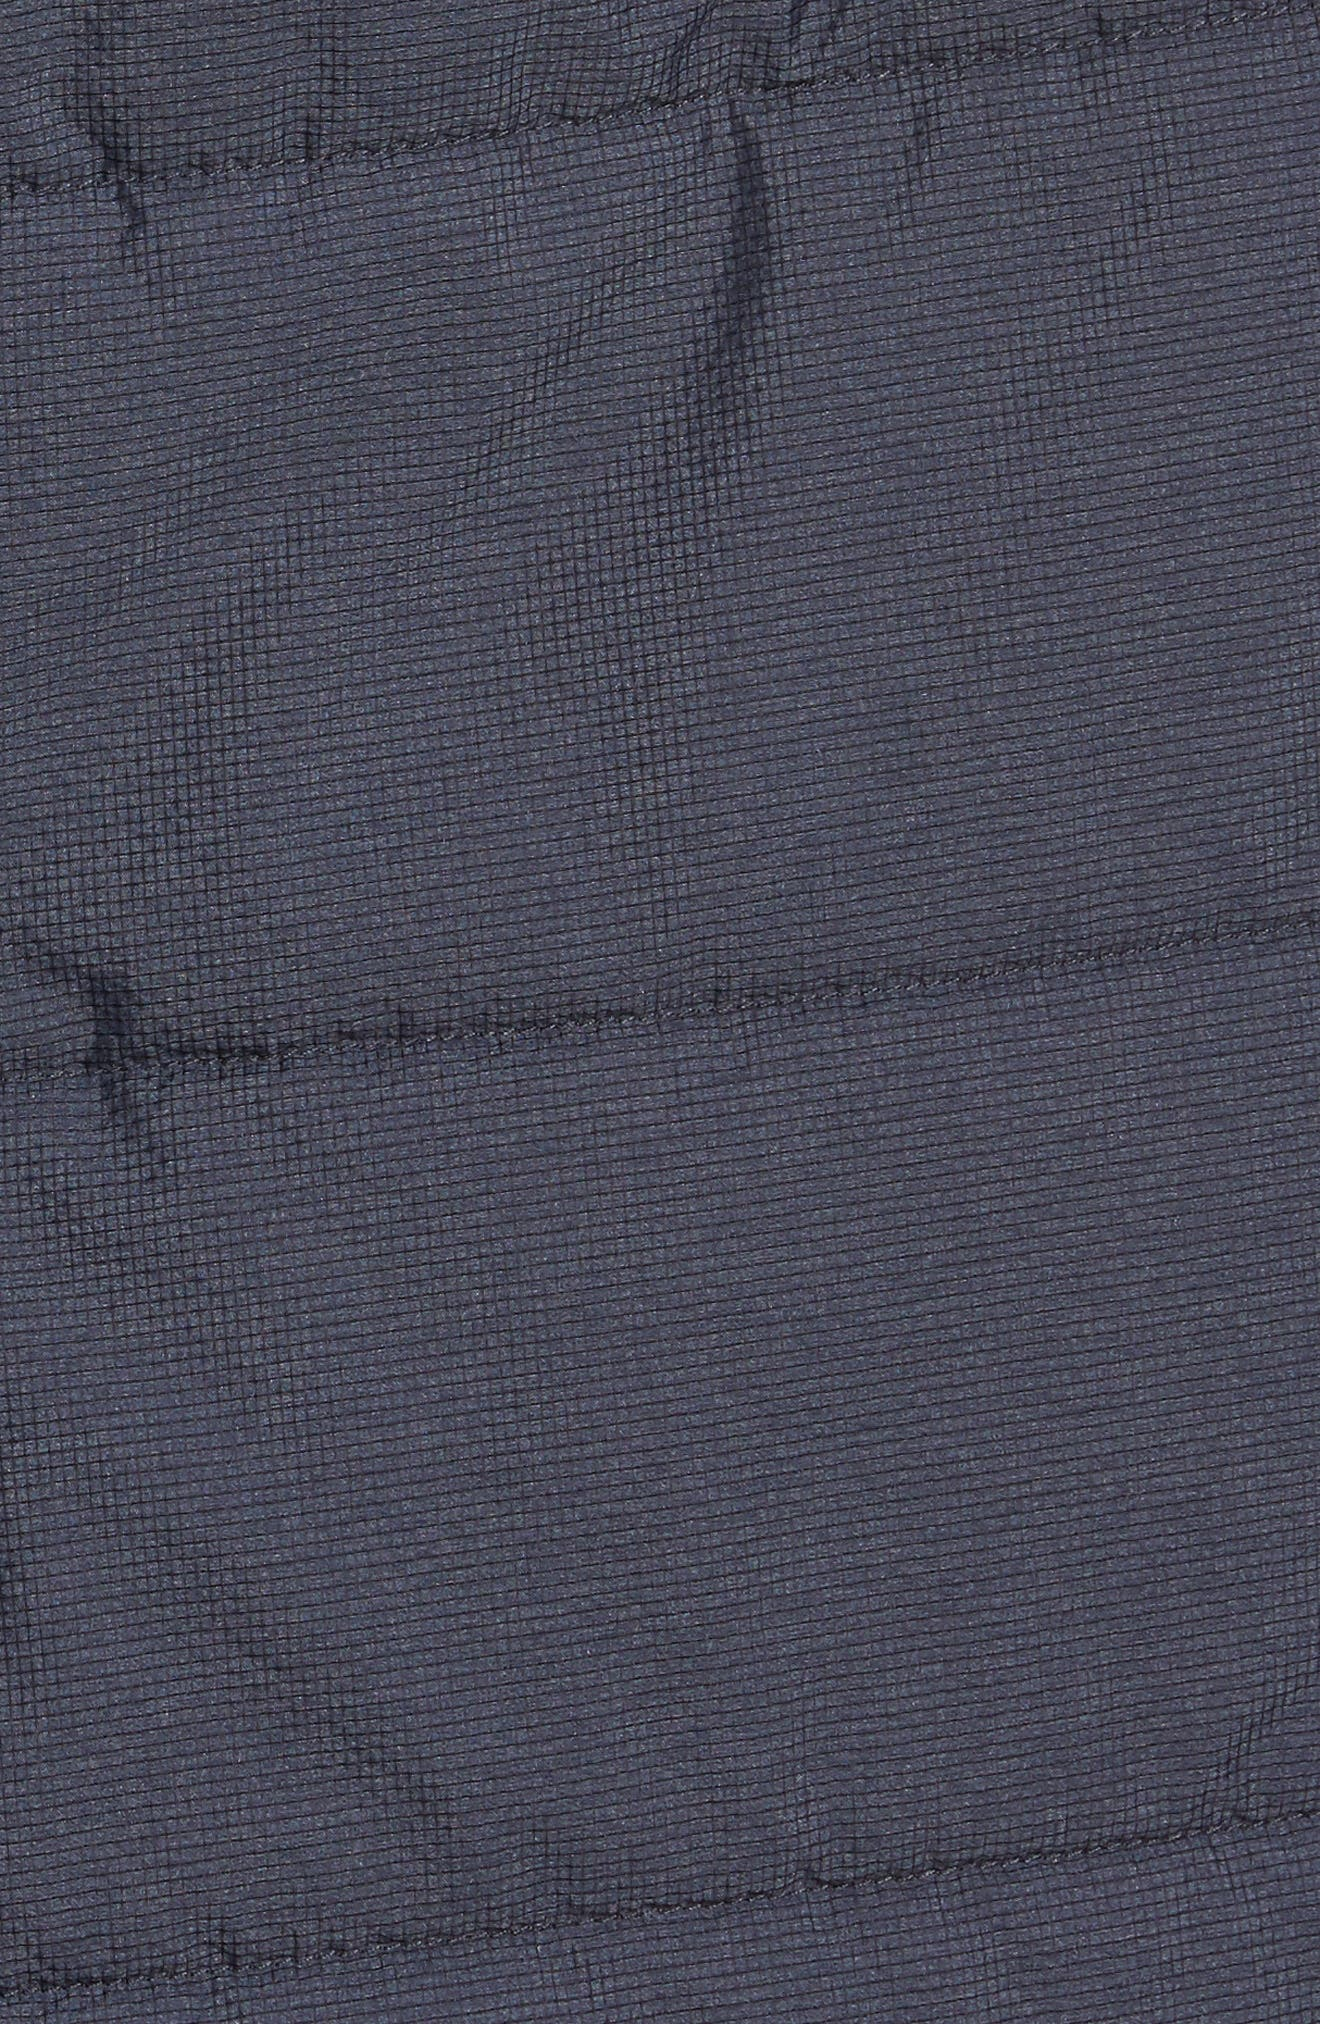 Foley Vest,                             Alternate thumbnail 5, color,                             Navy